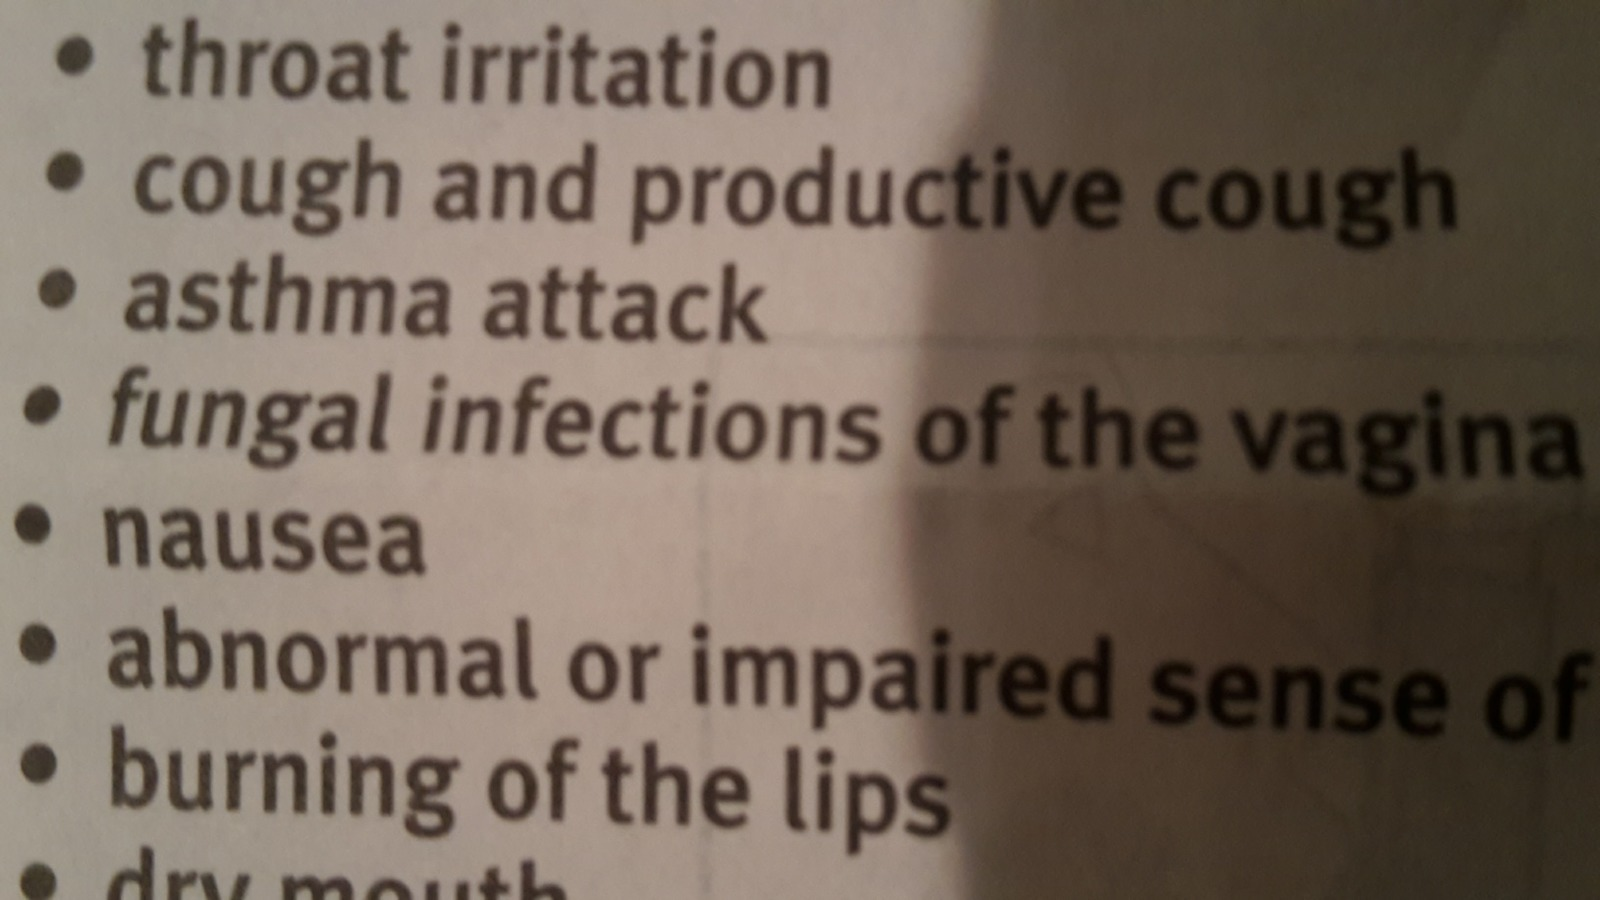 Health warnings on Garry's new medication